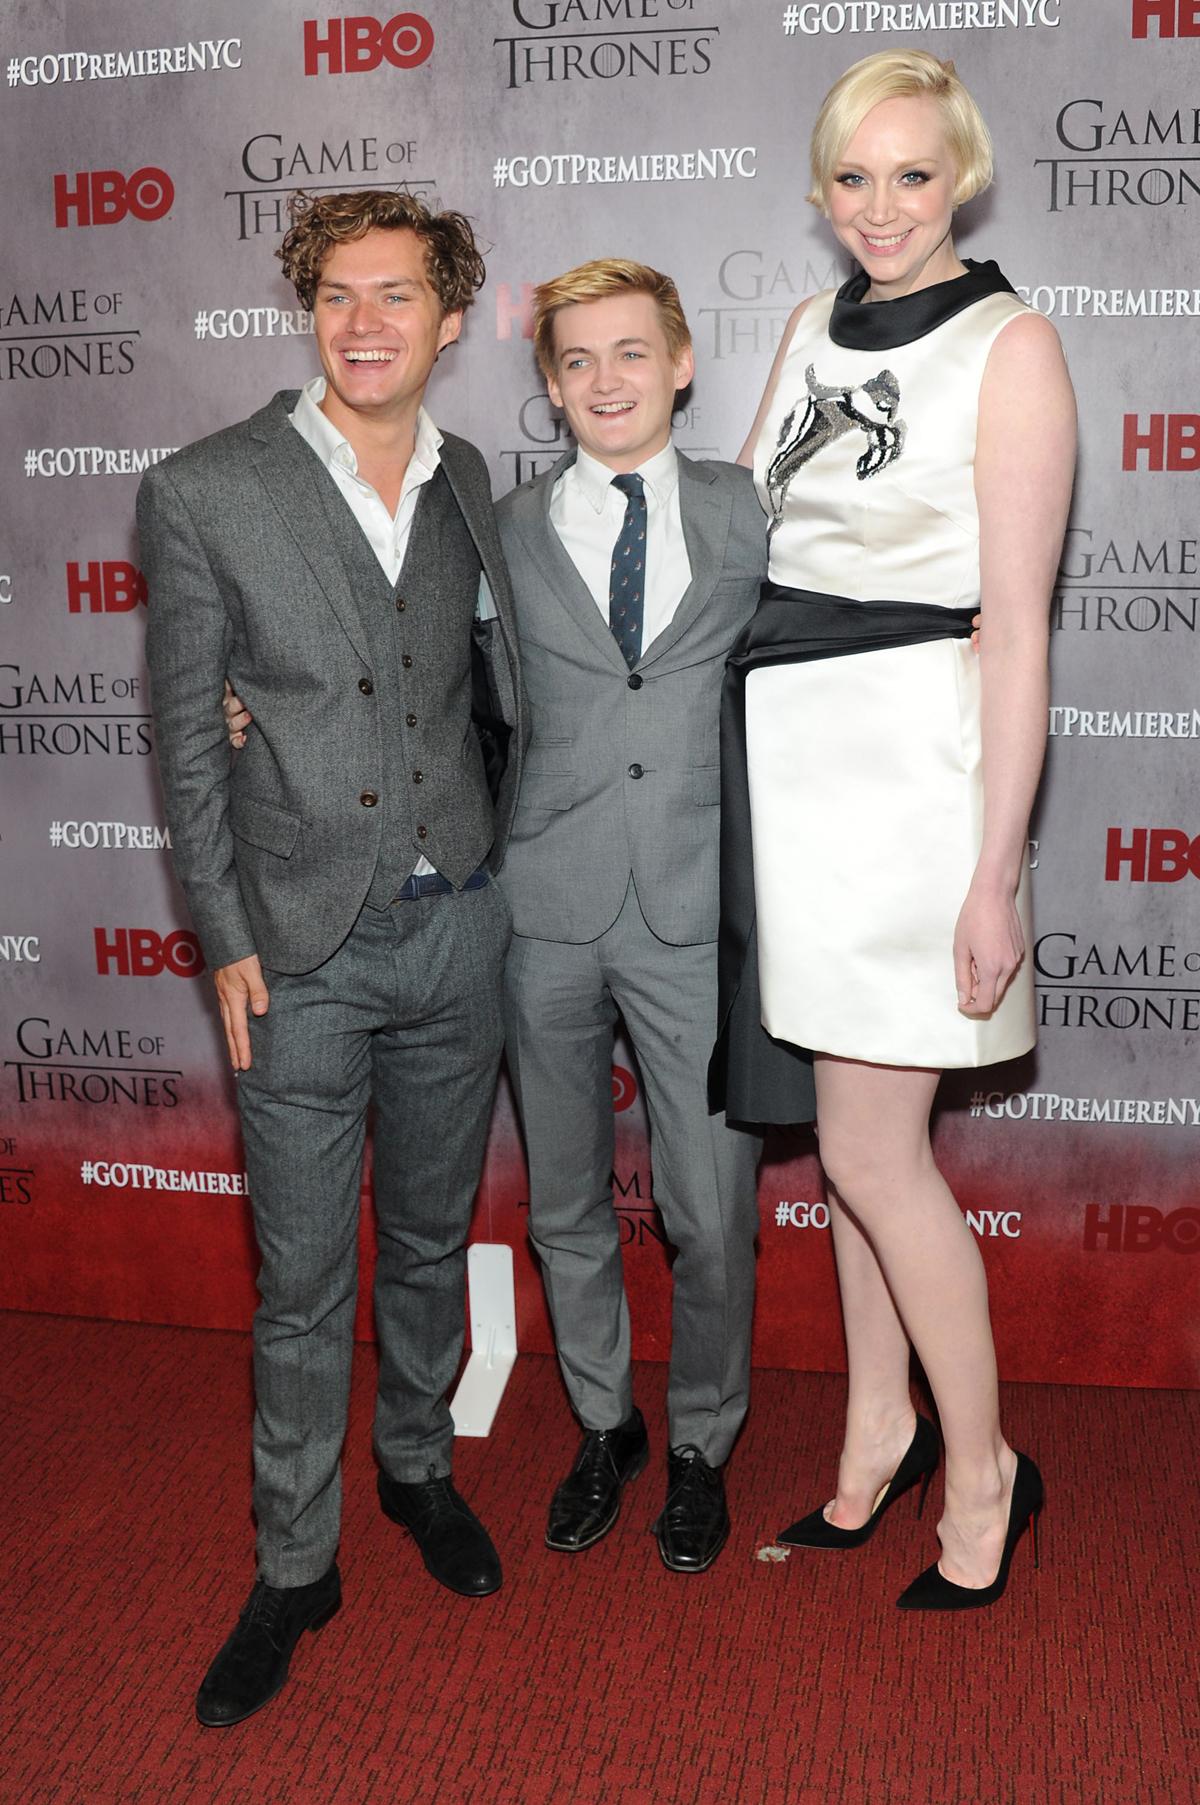 Loras, Joffery and Brienne